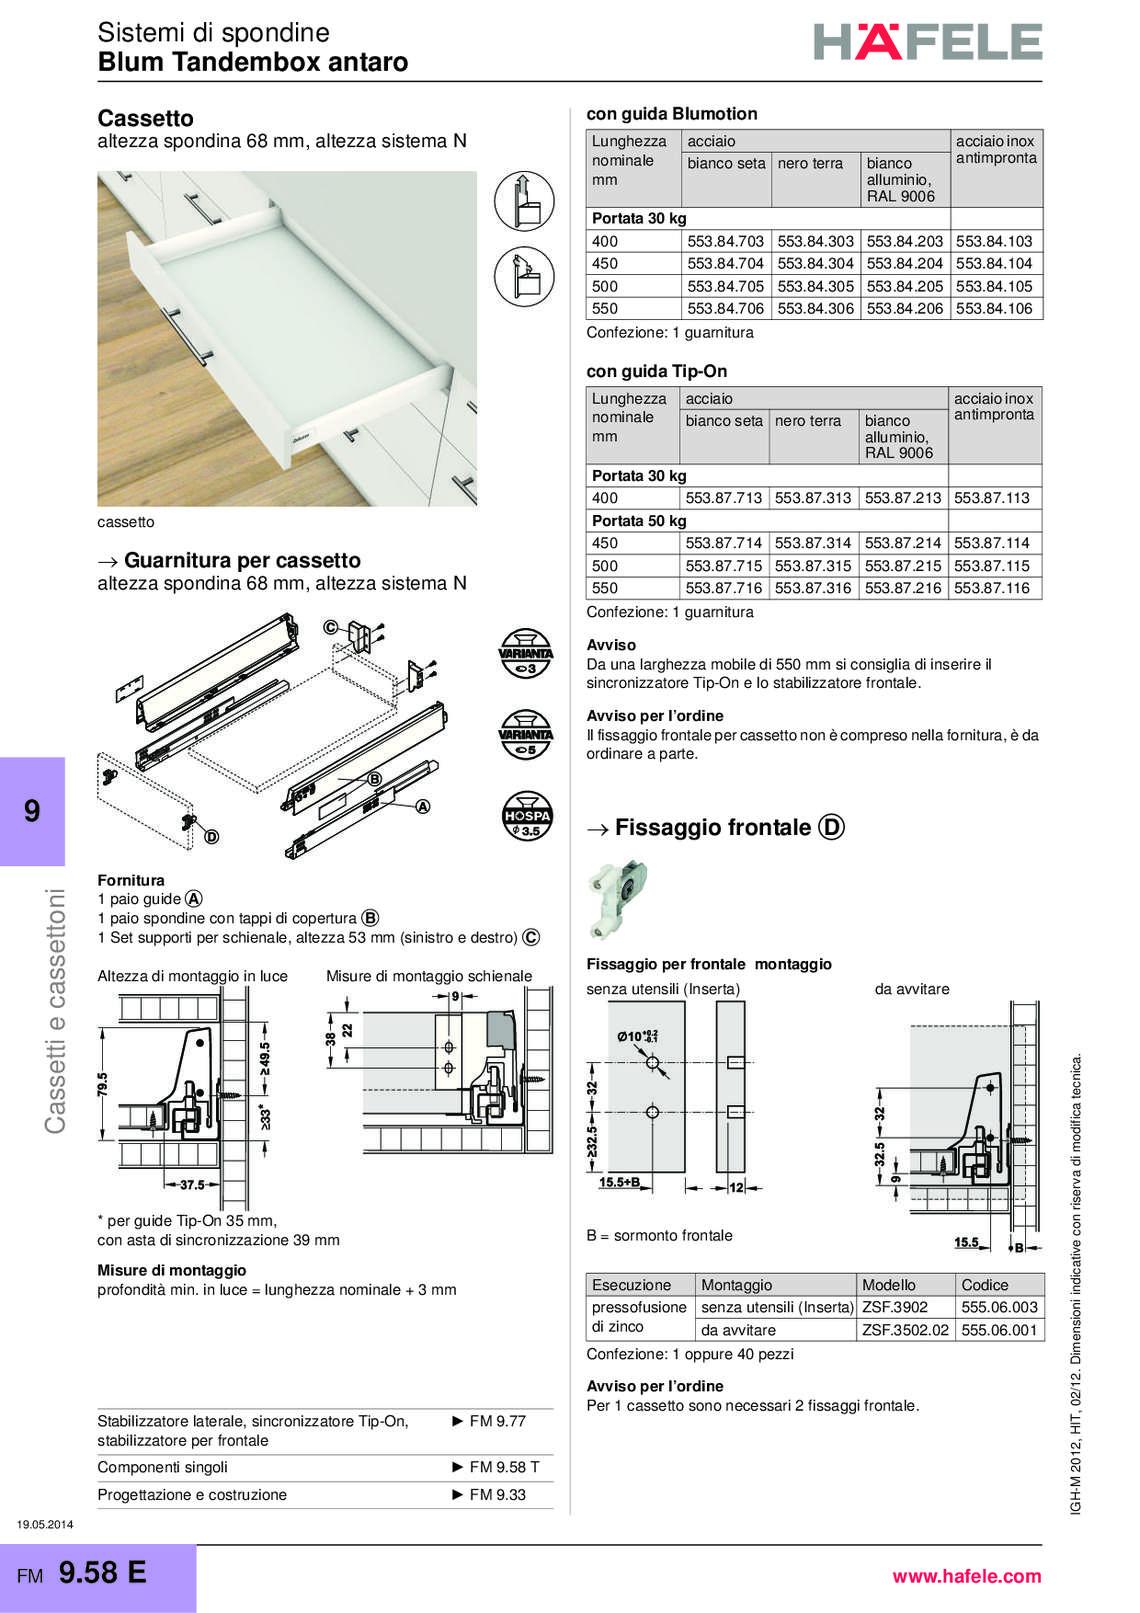 hafele-spondine-e-guide-per-mobili_40_079.jpg